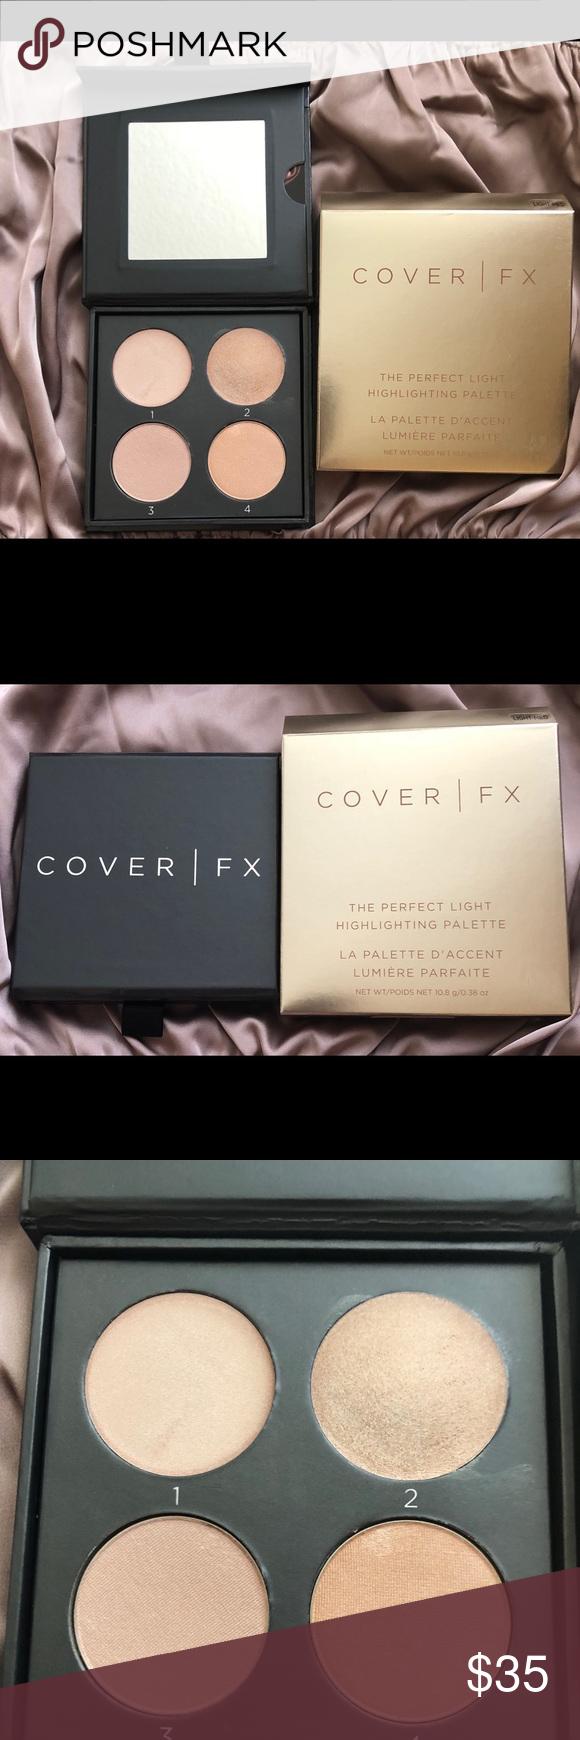 Makeup Cover Fx Cover Fx Cover Fx Makeup Makeup